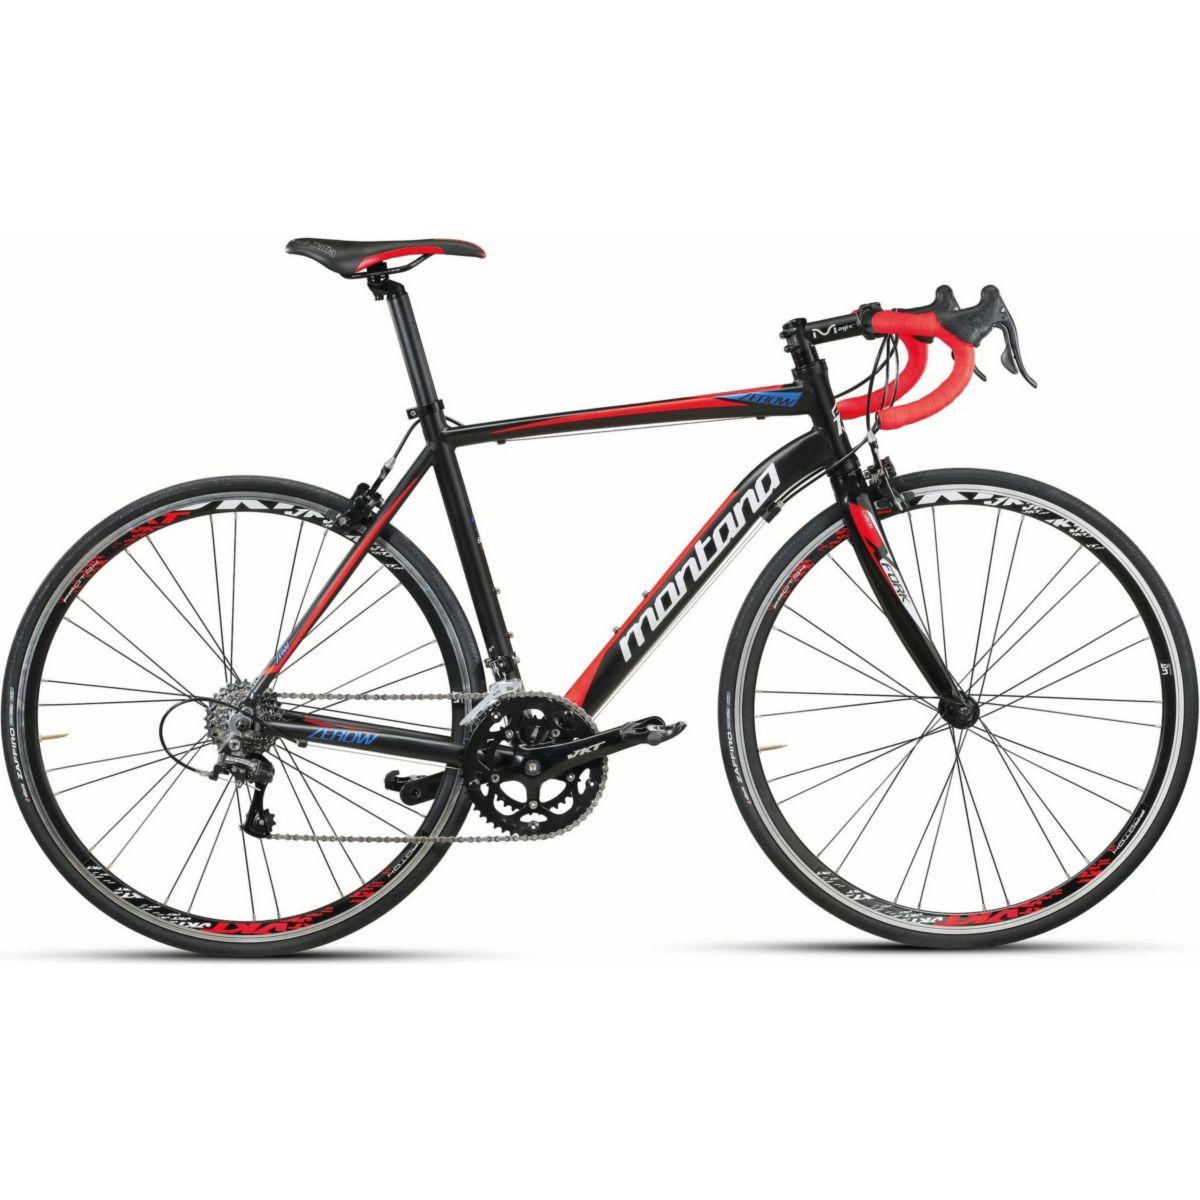 28 Zoll Montana Zerow Herren Rennrad Campagnolo 20 Gang Carbongabel schwarz-rot, 55cm - broschei